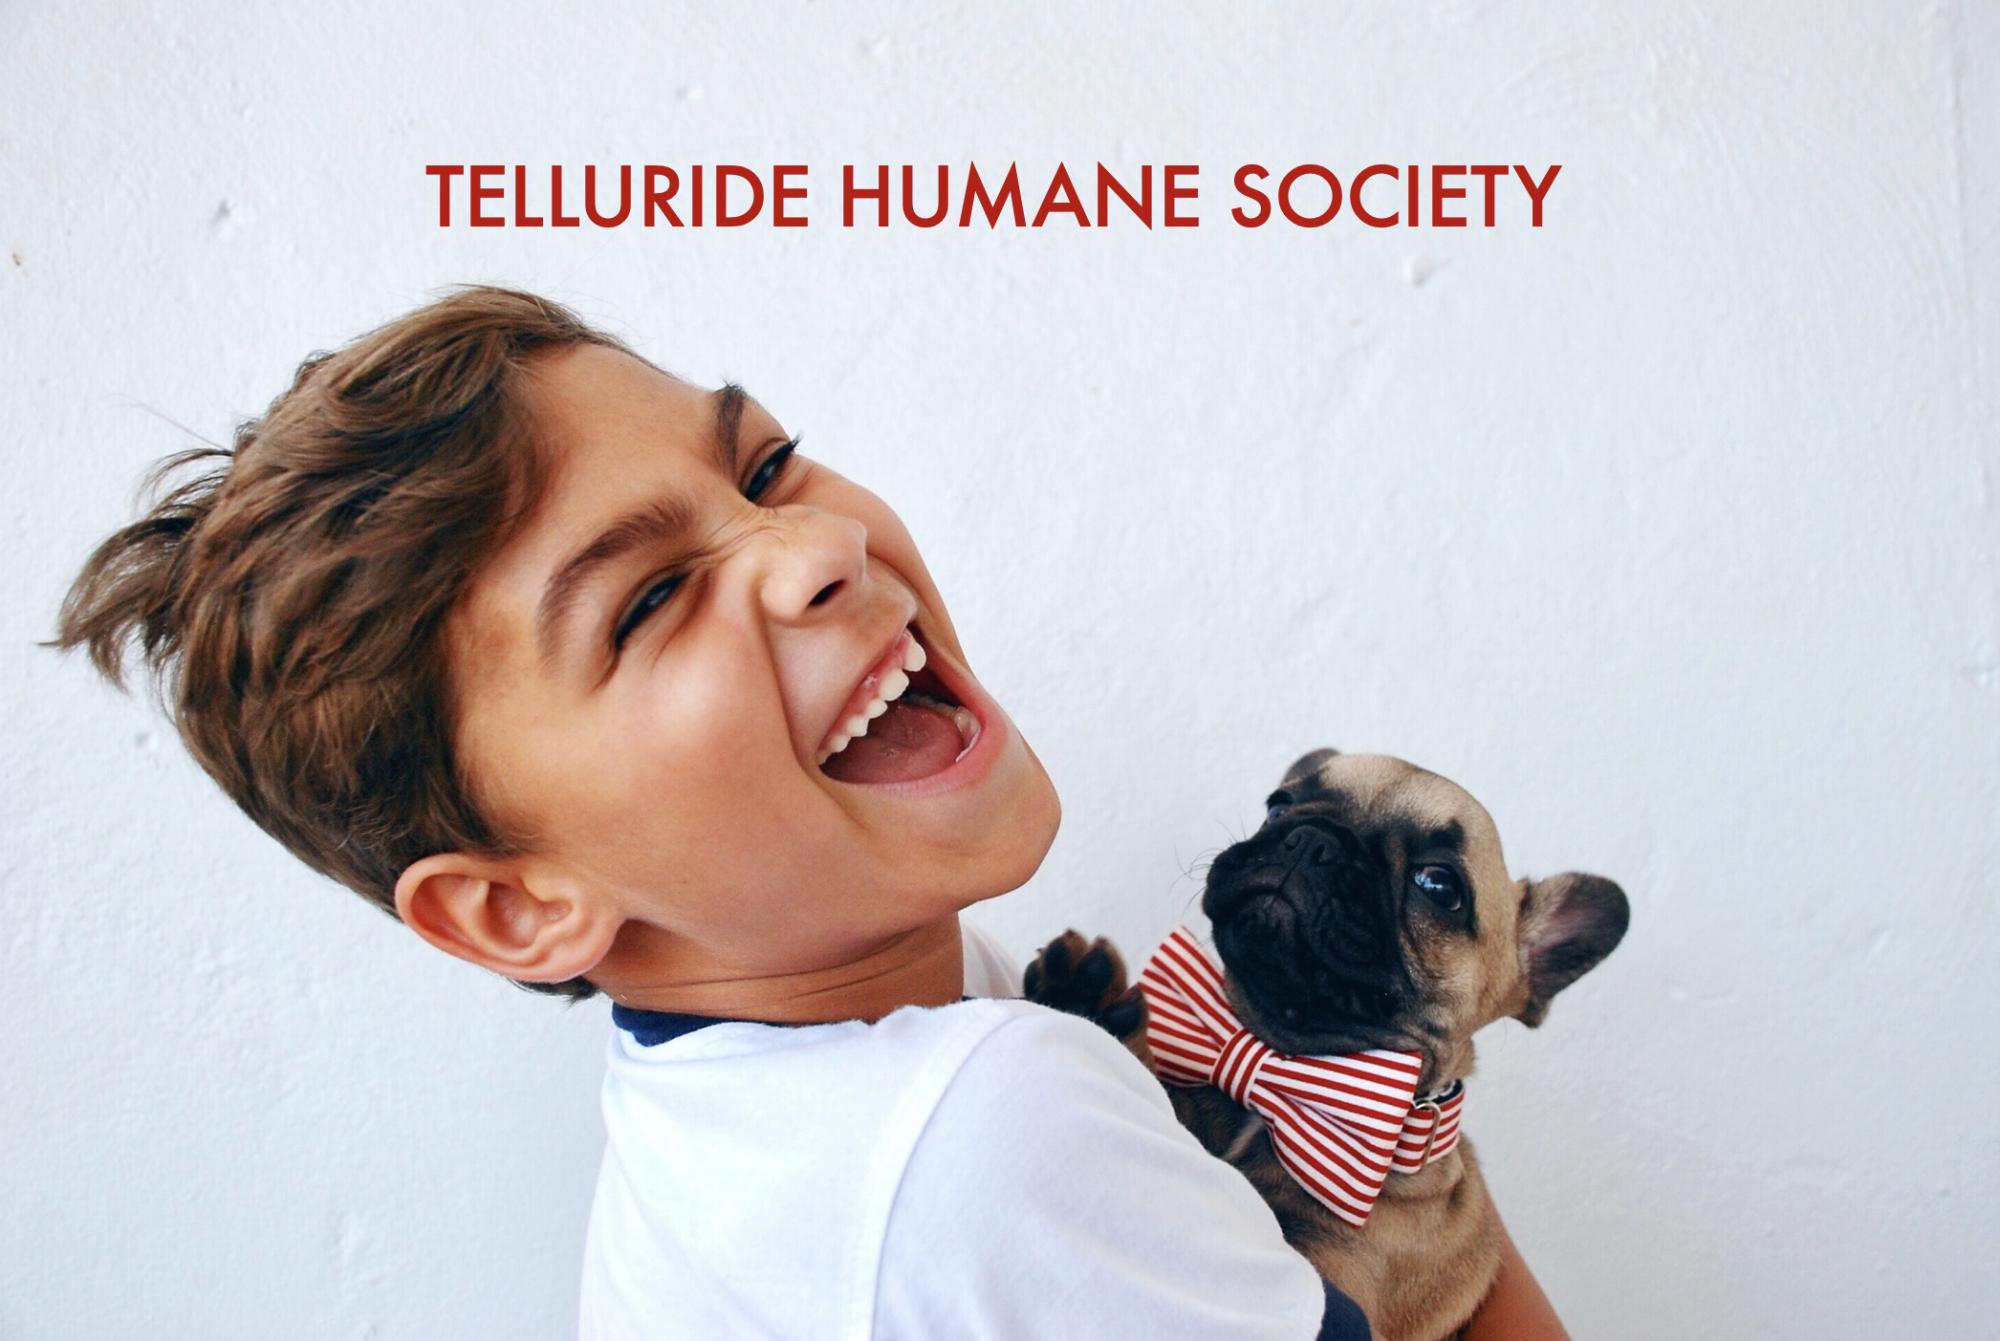 Telluride Humane Society